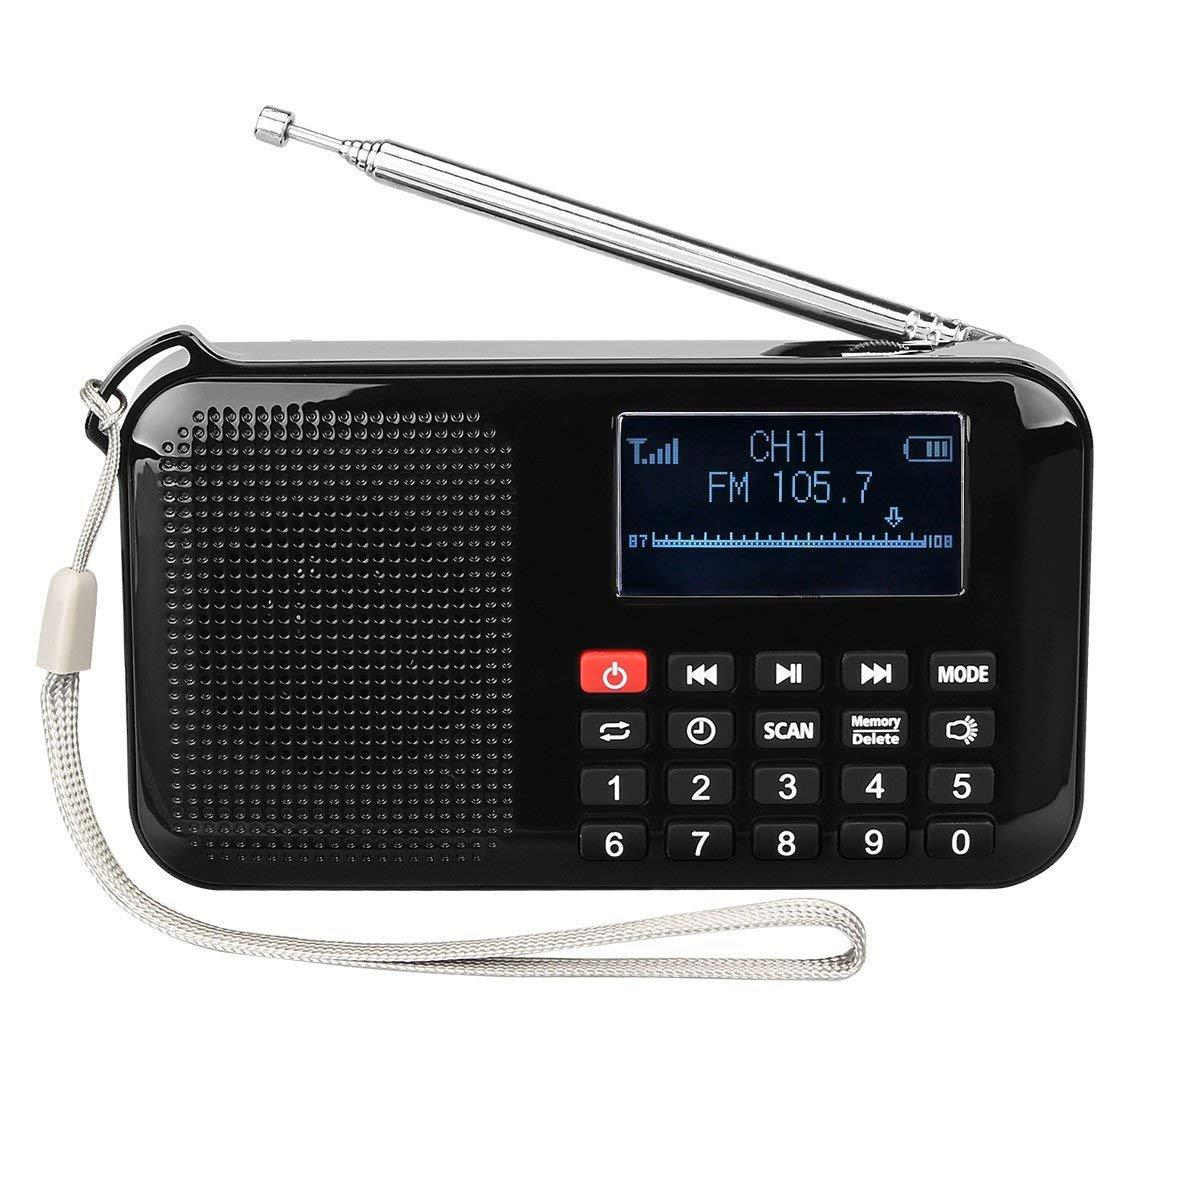 Portable Solar Power Speaker Mp3 Audio Music Player FM Radio with Power Bank USB disk TF card with Flashlight Sleep Timer